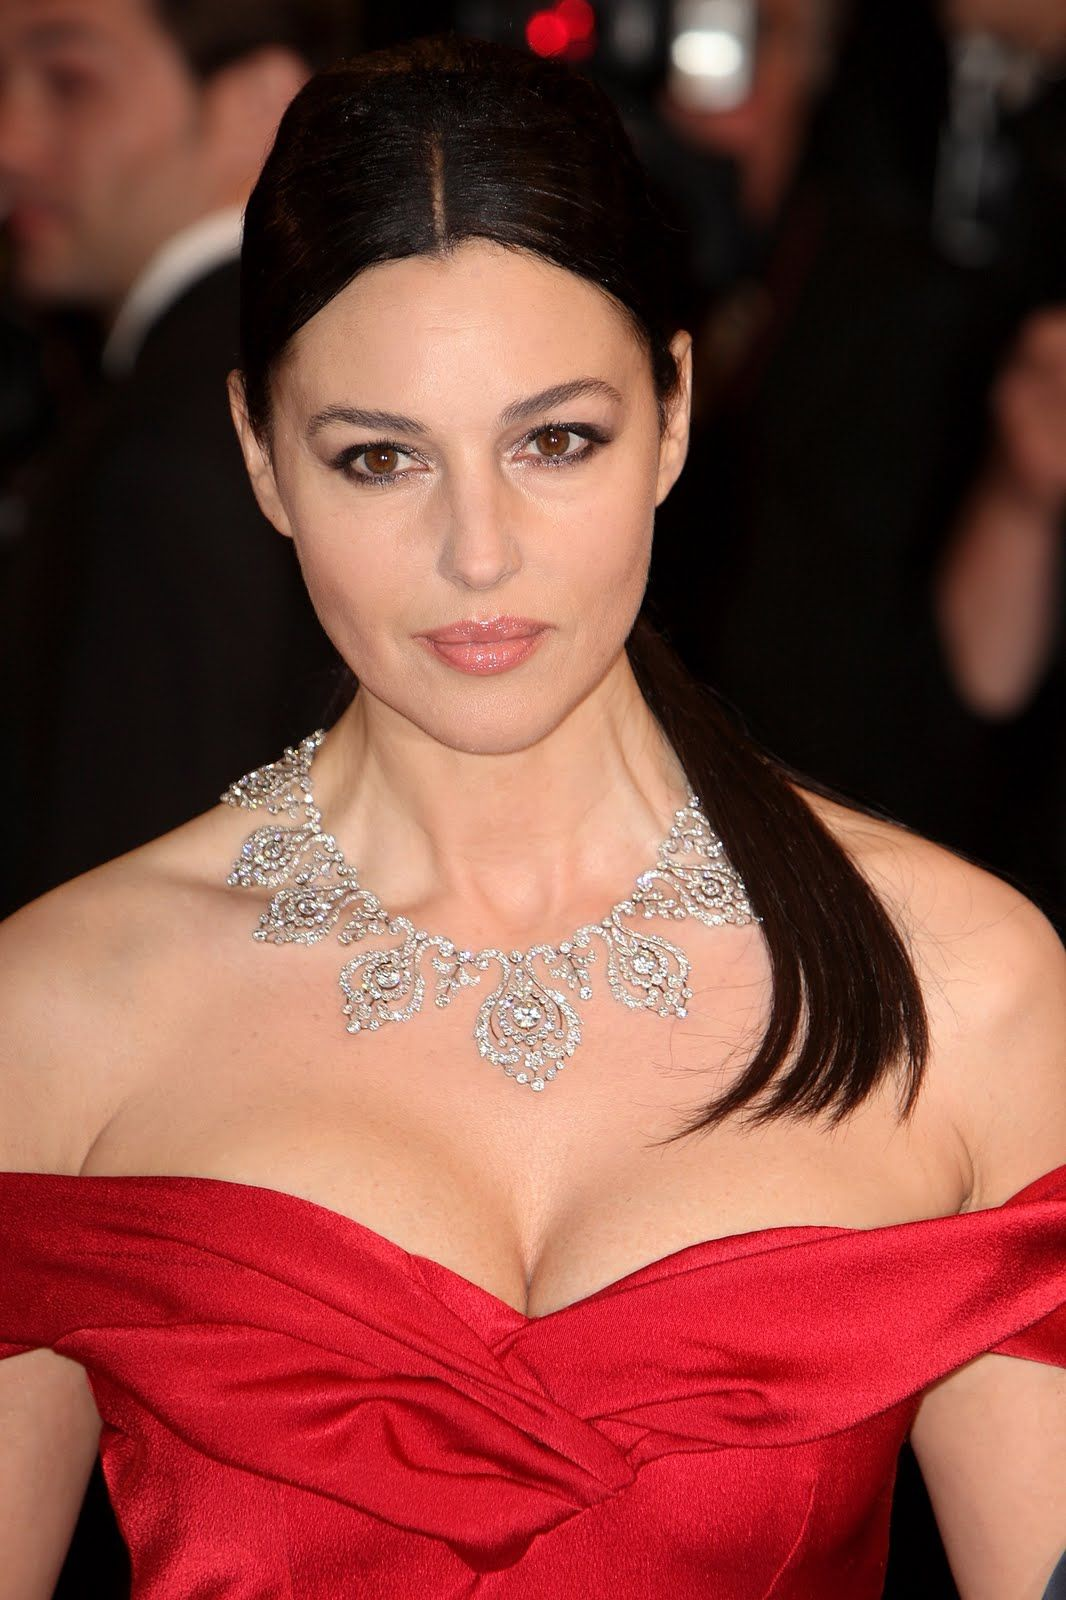 INDIAN ACTRESS: Hollywood actress Monica Bellucci hot and